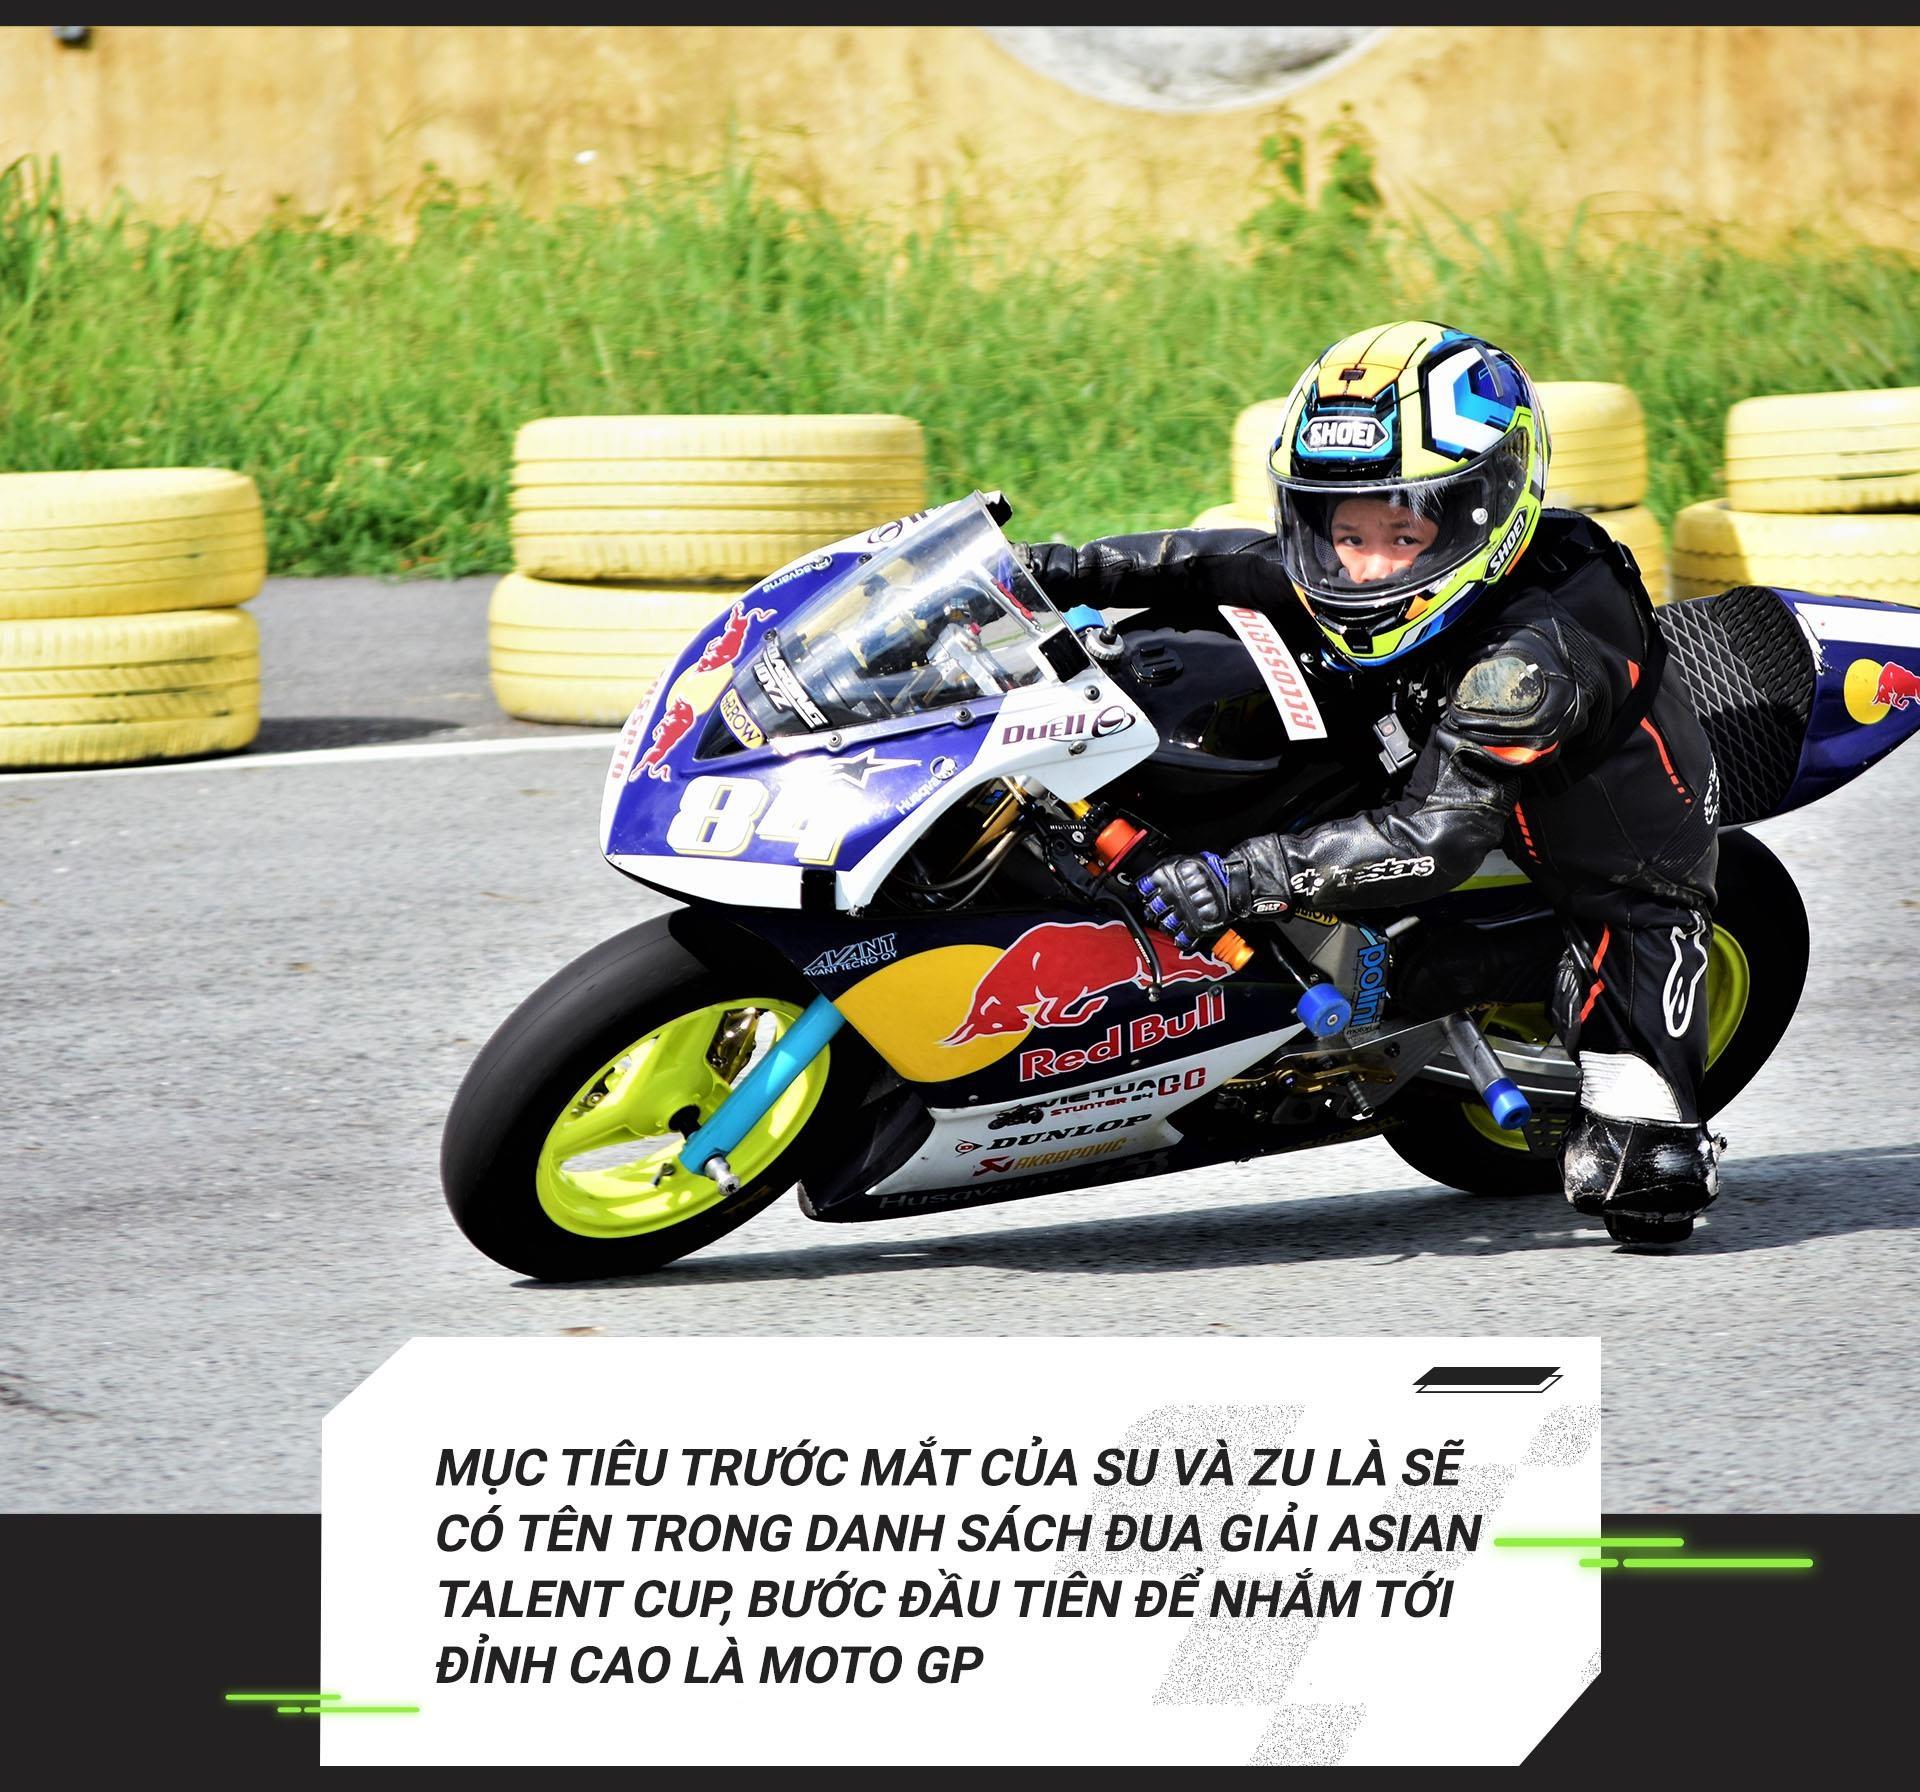 Cau be 7 tuoi uoc mo tro thanh tay dua Moto GP dau tien tai VN hinh anh 20